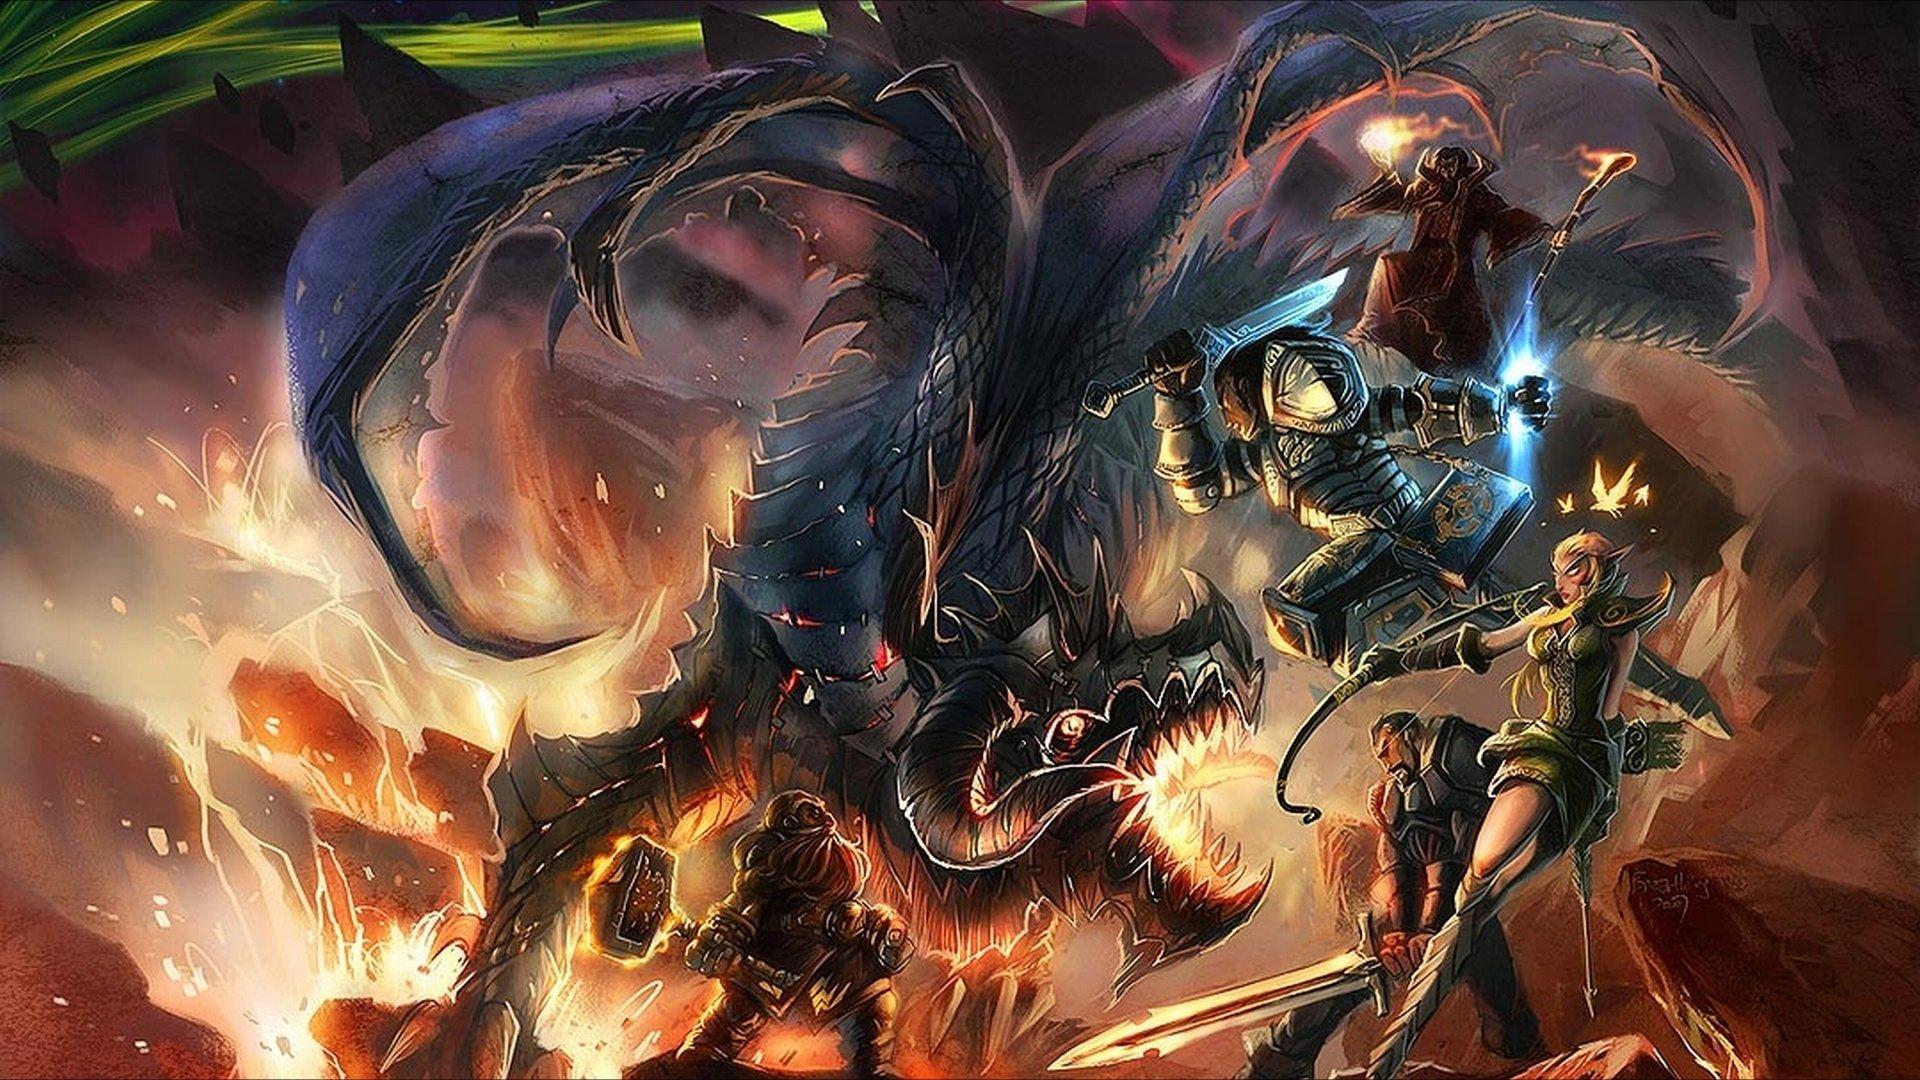 World Of Warcraft The Dark Portal Uhd 4k Wallpaper: World Of Warcraft 4k Ultra HD Wallpaper